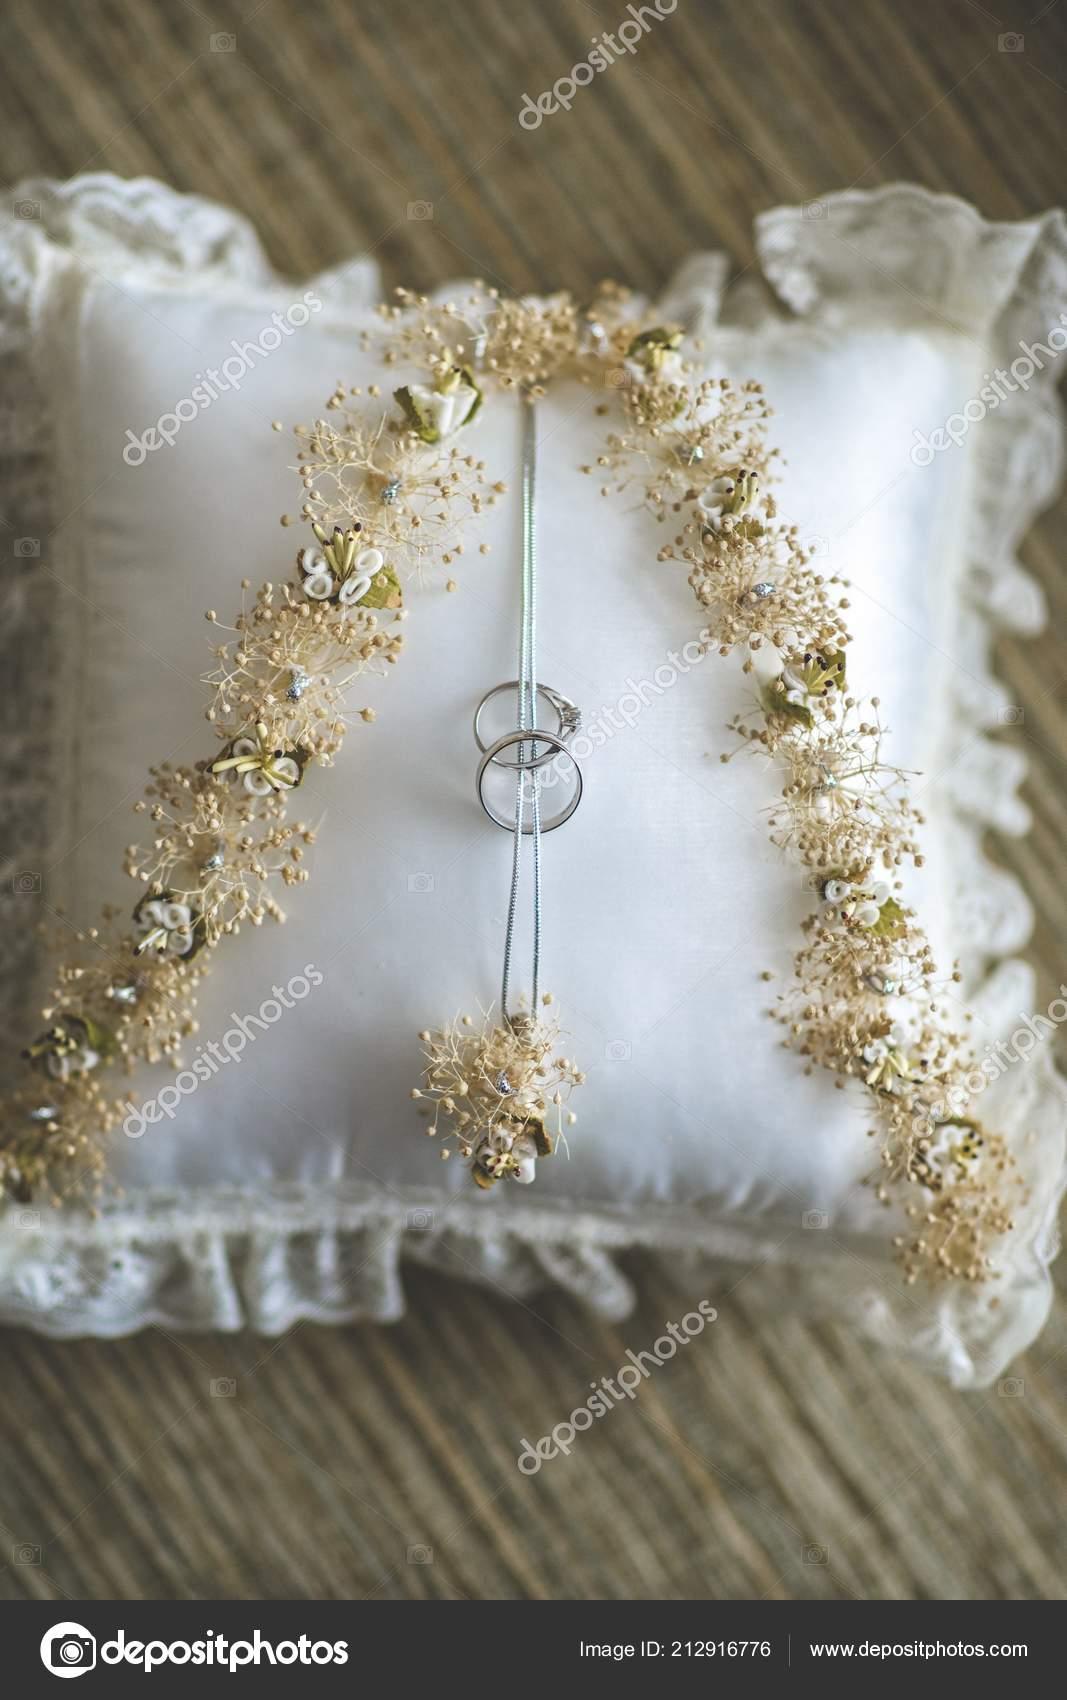 Used Wedding Rings.Wedding Rings Sewn Traditional Cushion Ready Used Wedding Day